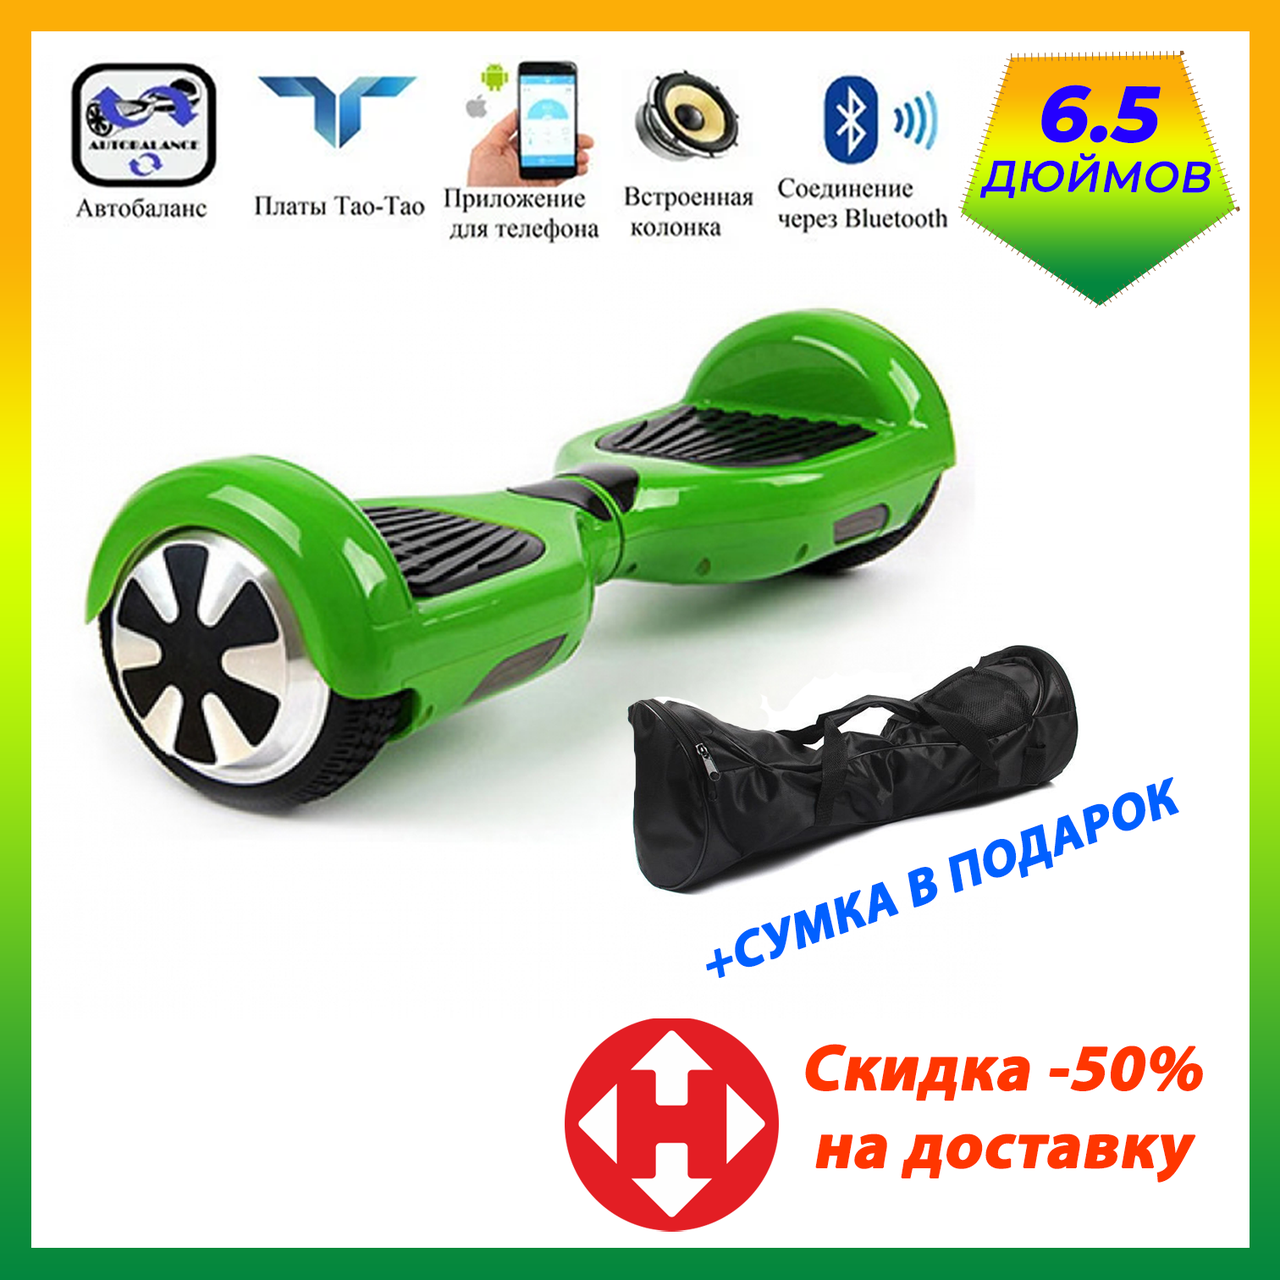 Гироскутер Smart Balance Pro 6.5 Зелений (Green) TaoTao APP. Гироборд Про зелений. Автобаланс